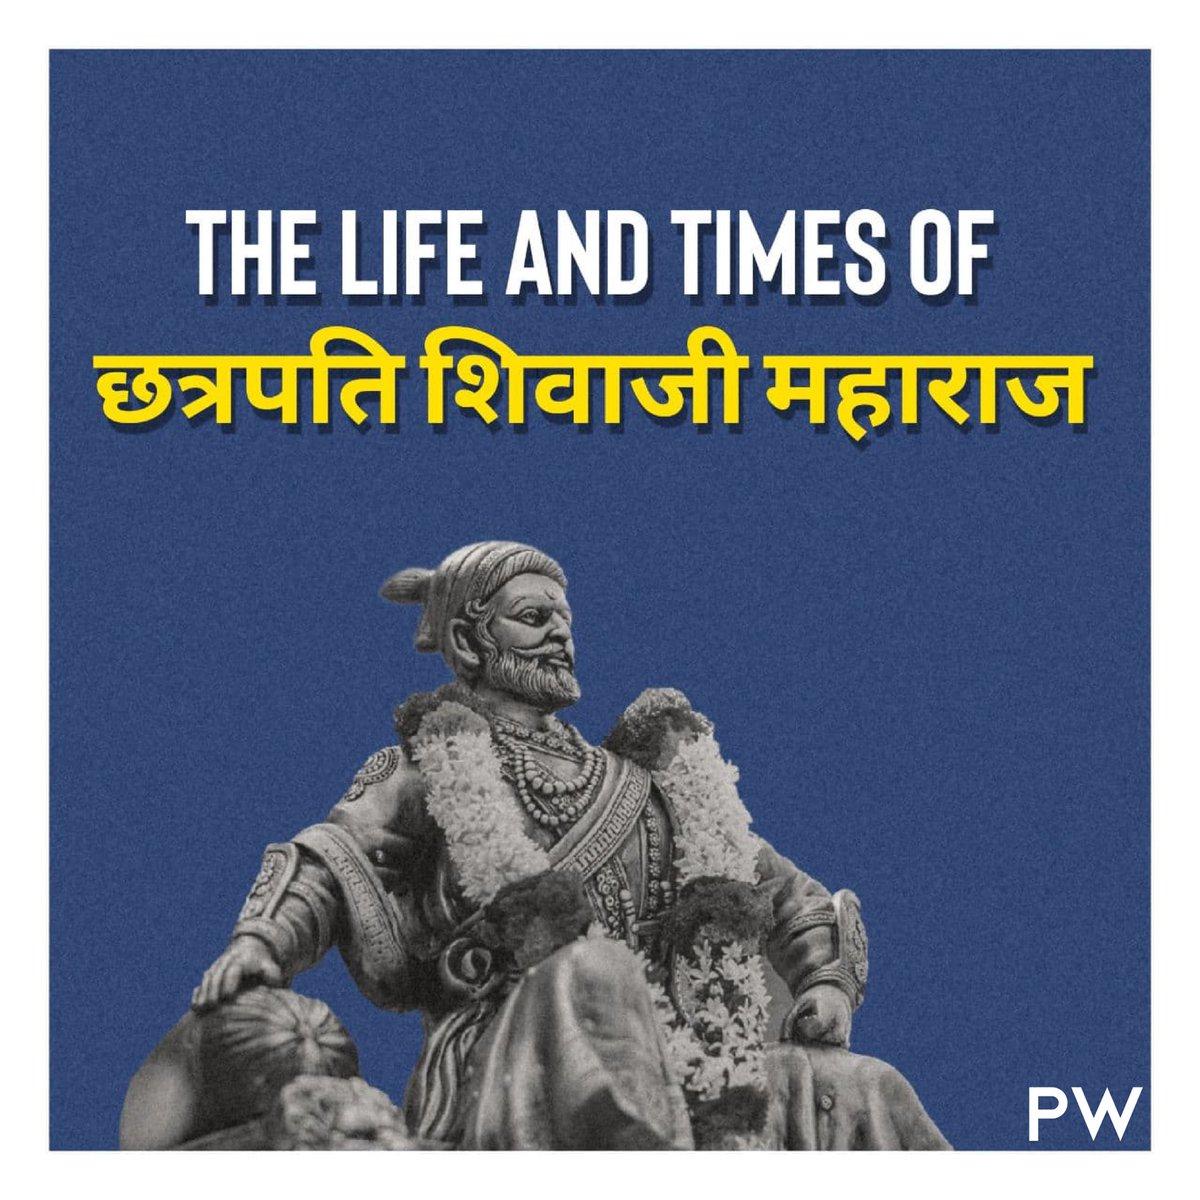 #ShivajiMaharaj #ChhatrapatiShivajiMaharaj